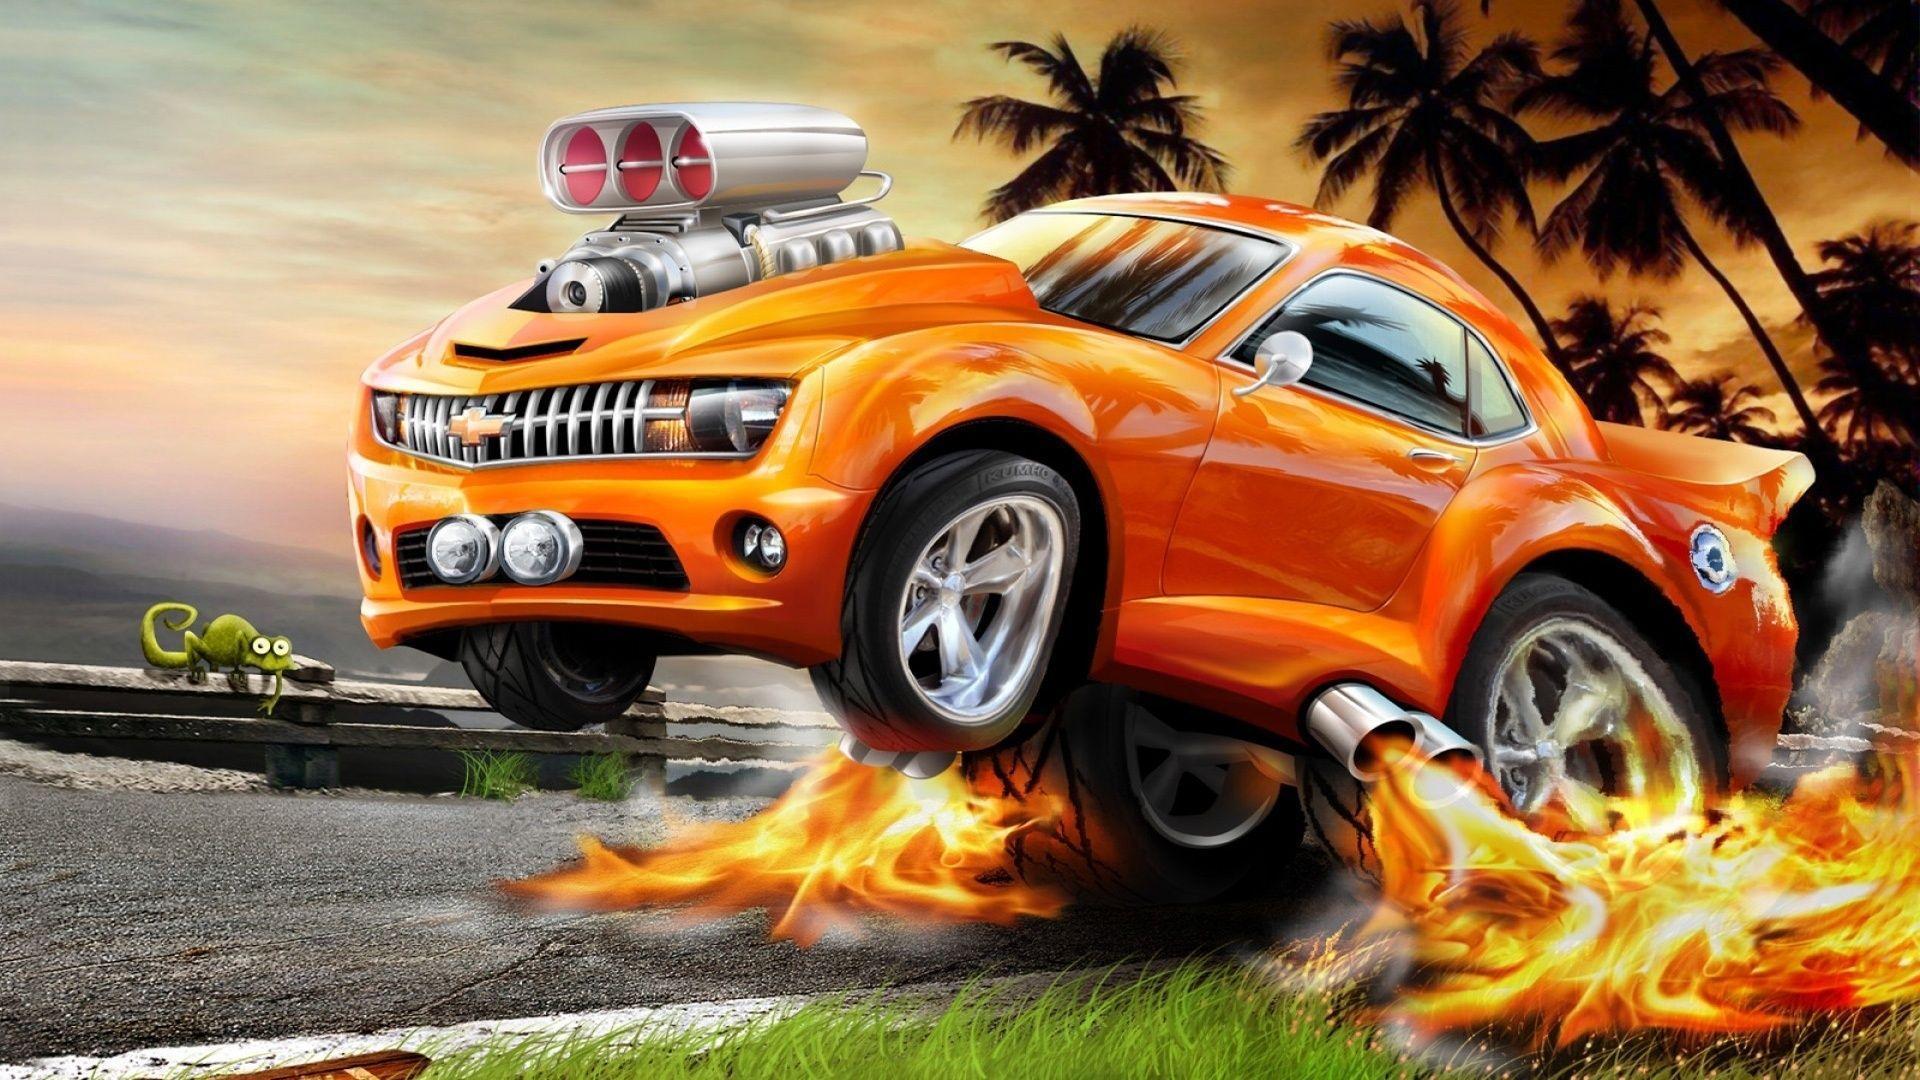 Amazing Wallpaper Logo Hot Wheel - wp1860116  Photograph_99335.jpg